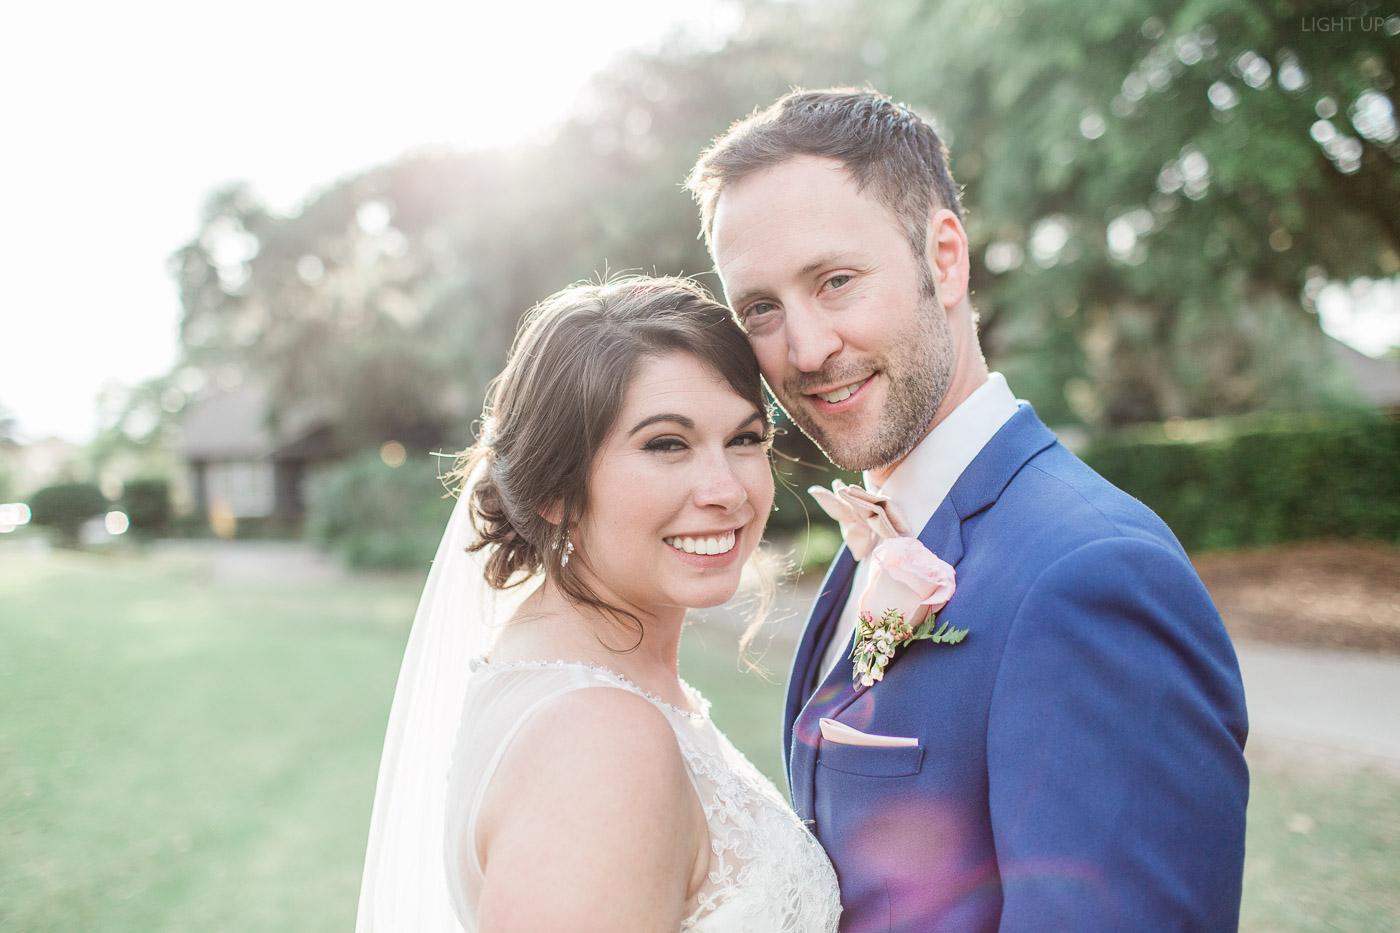 hstoric-dubsdread-wedding-orlando-24.jpg